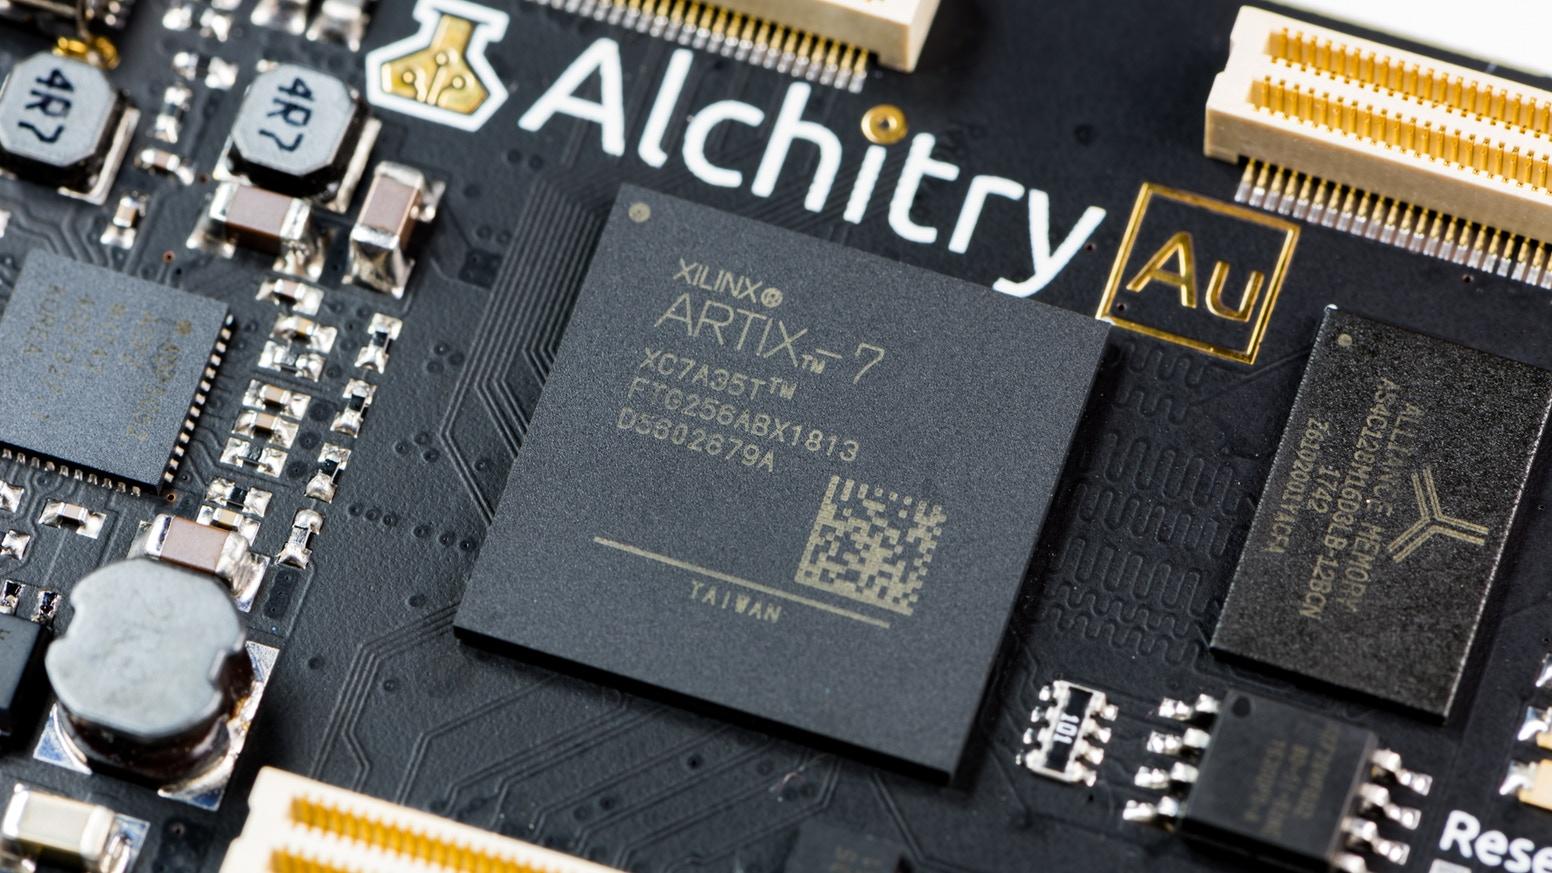 Alchitry – FPGA development boards for hobbyists